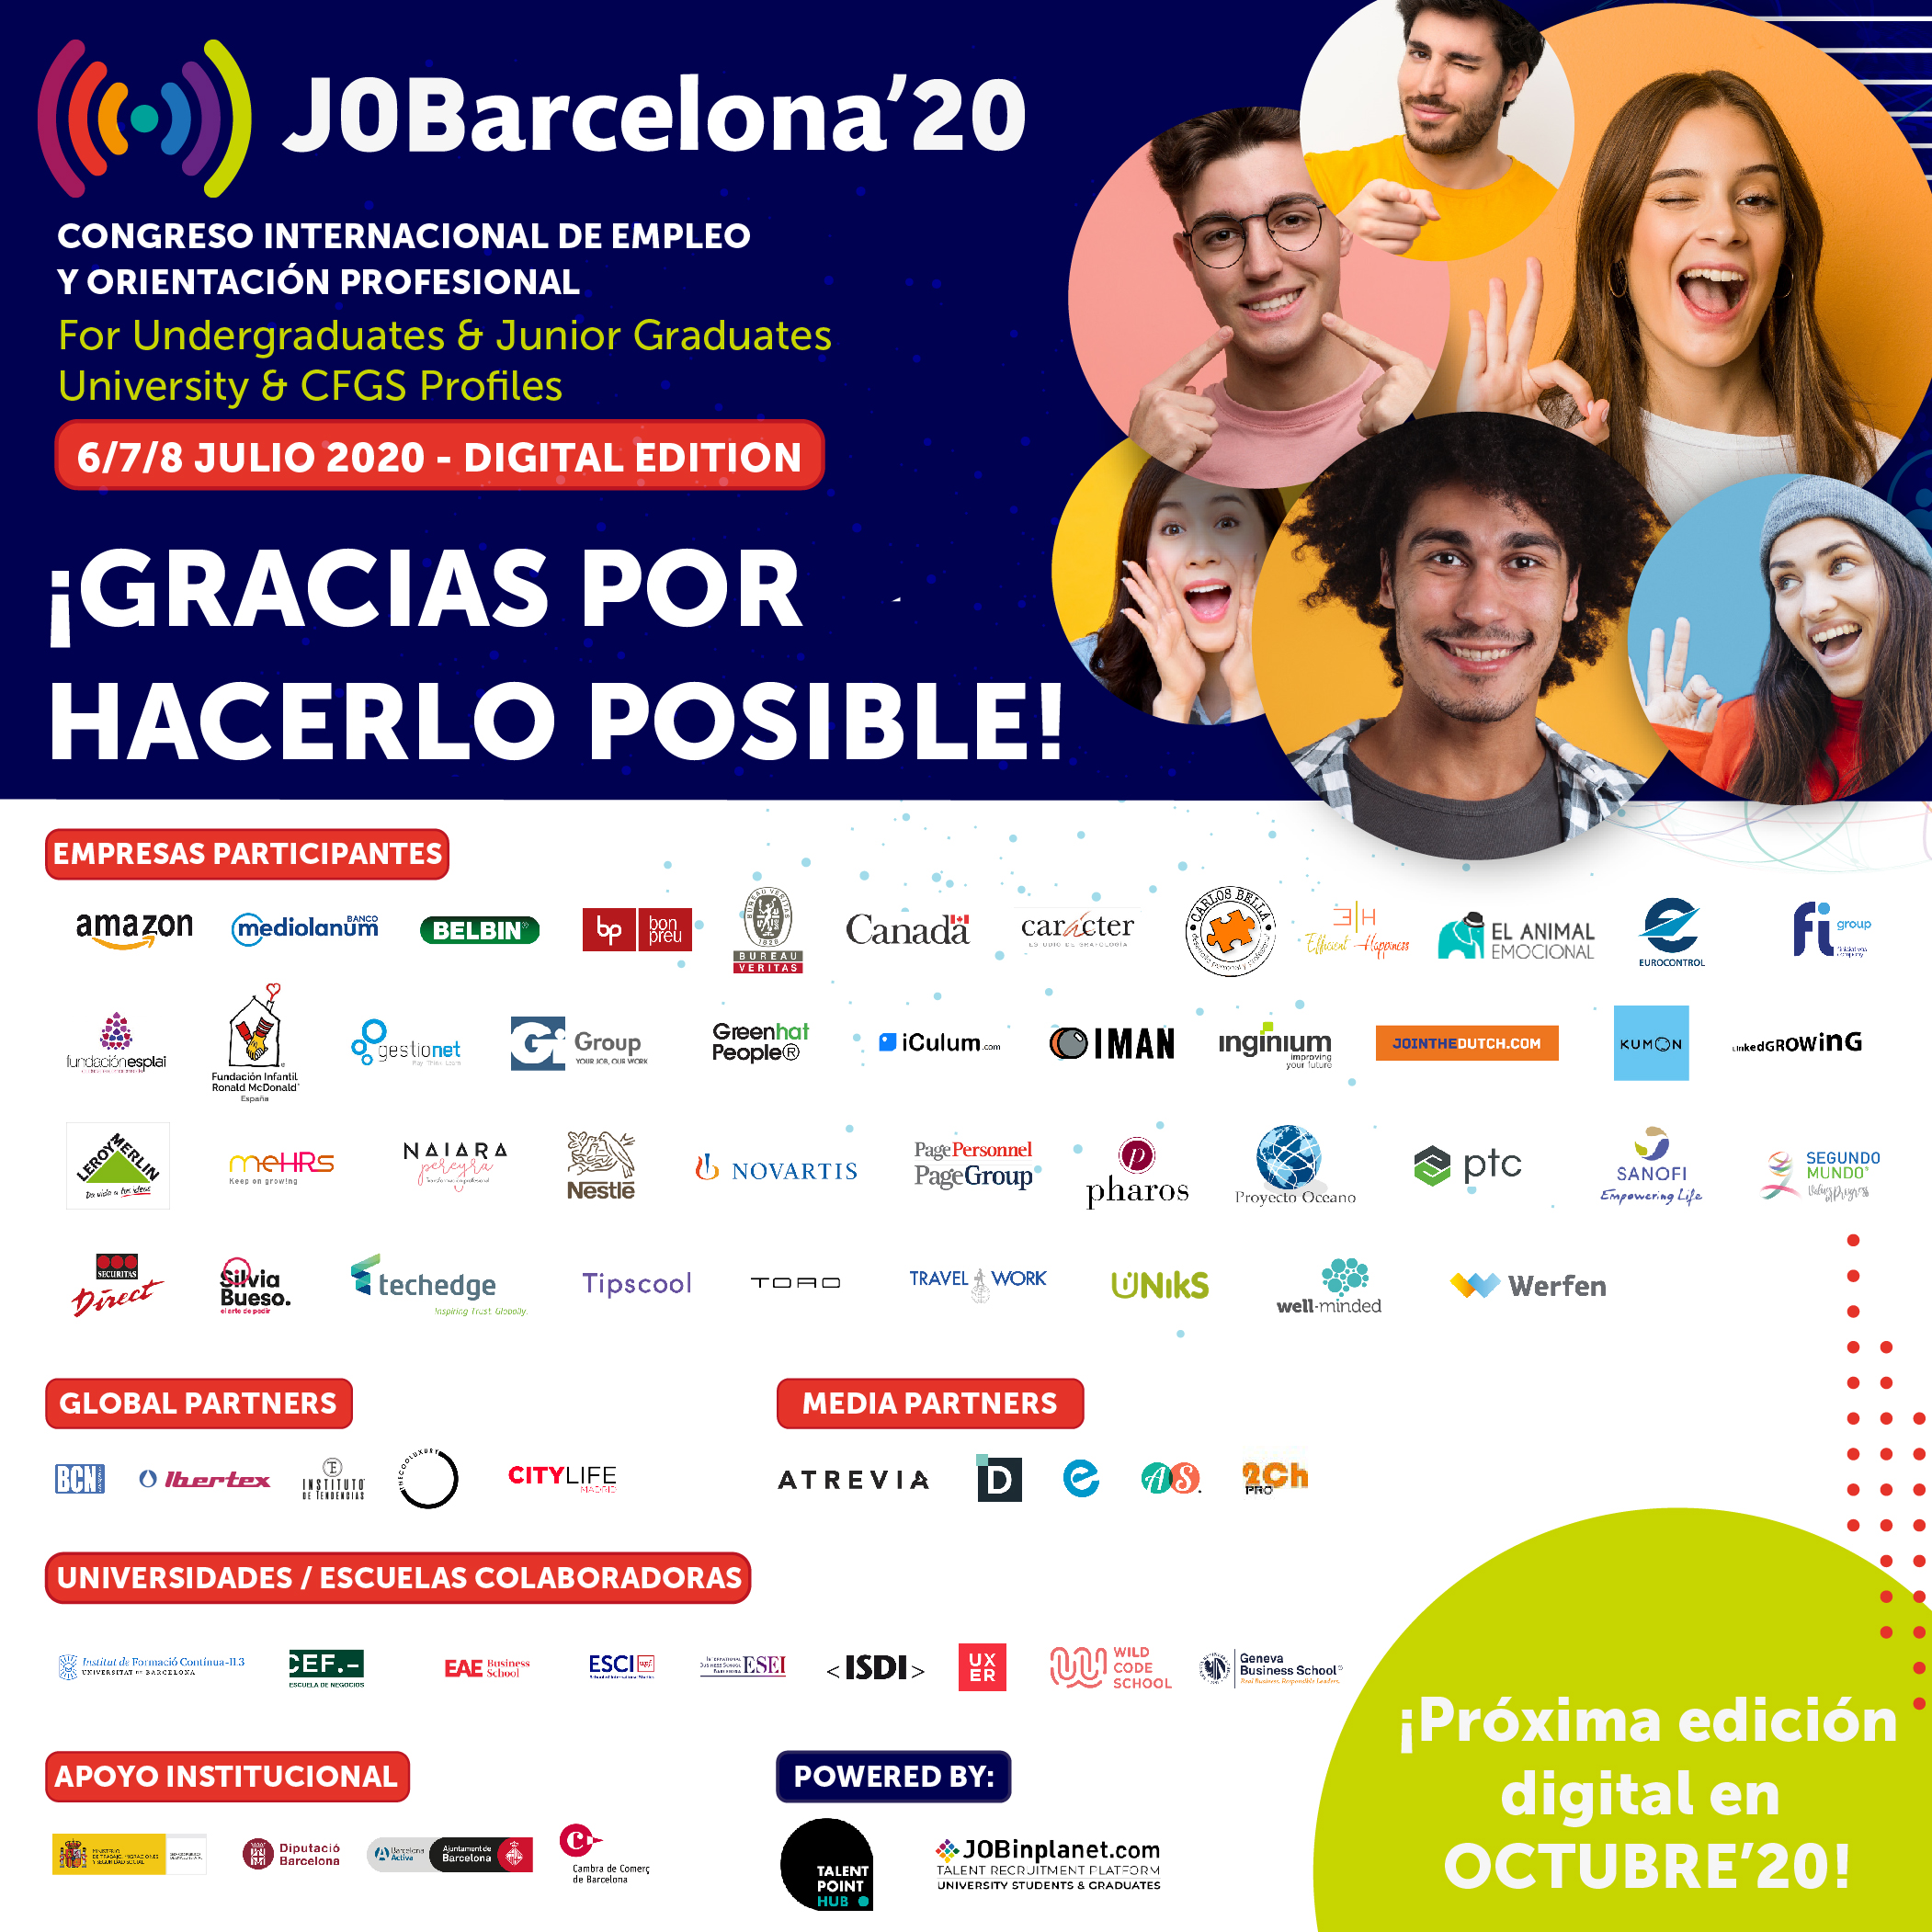 JOBarcelona 20